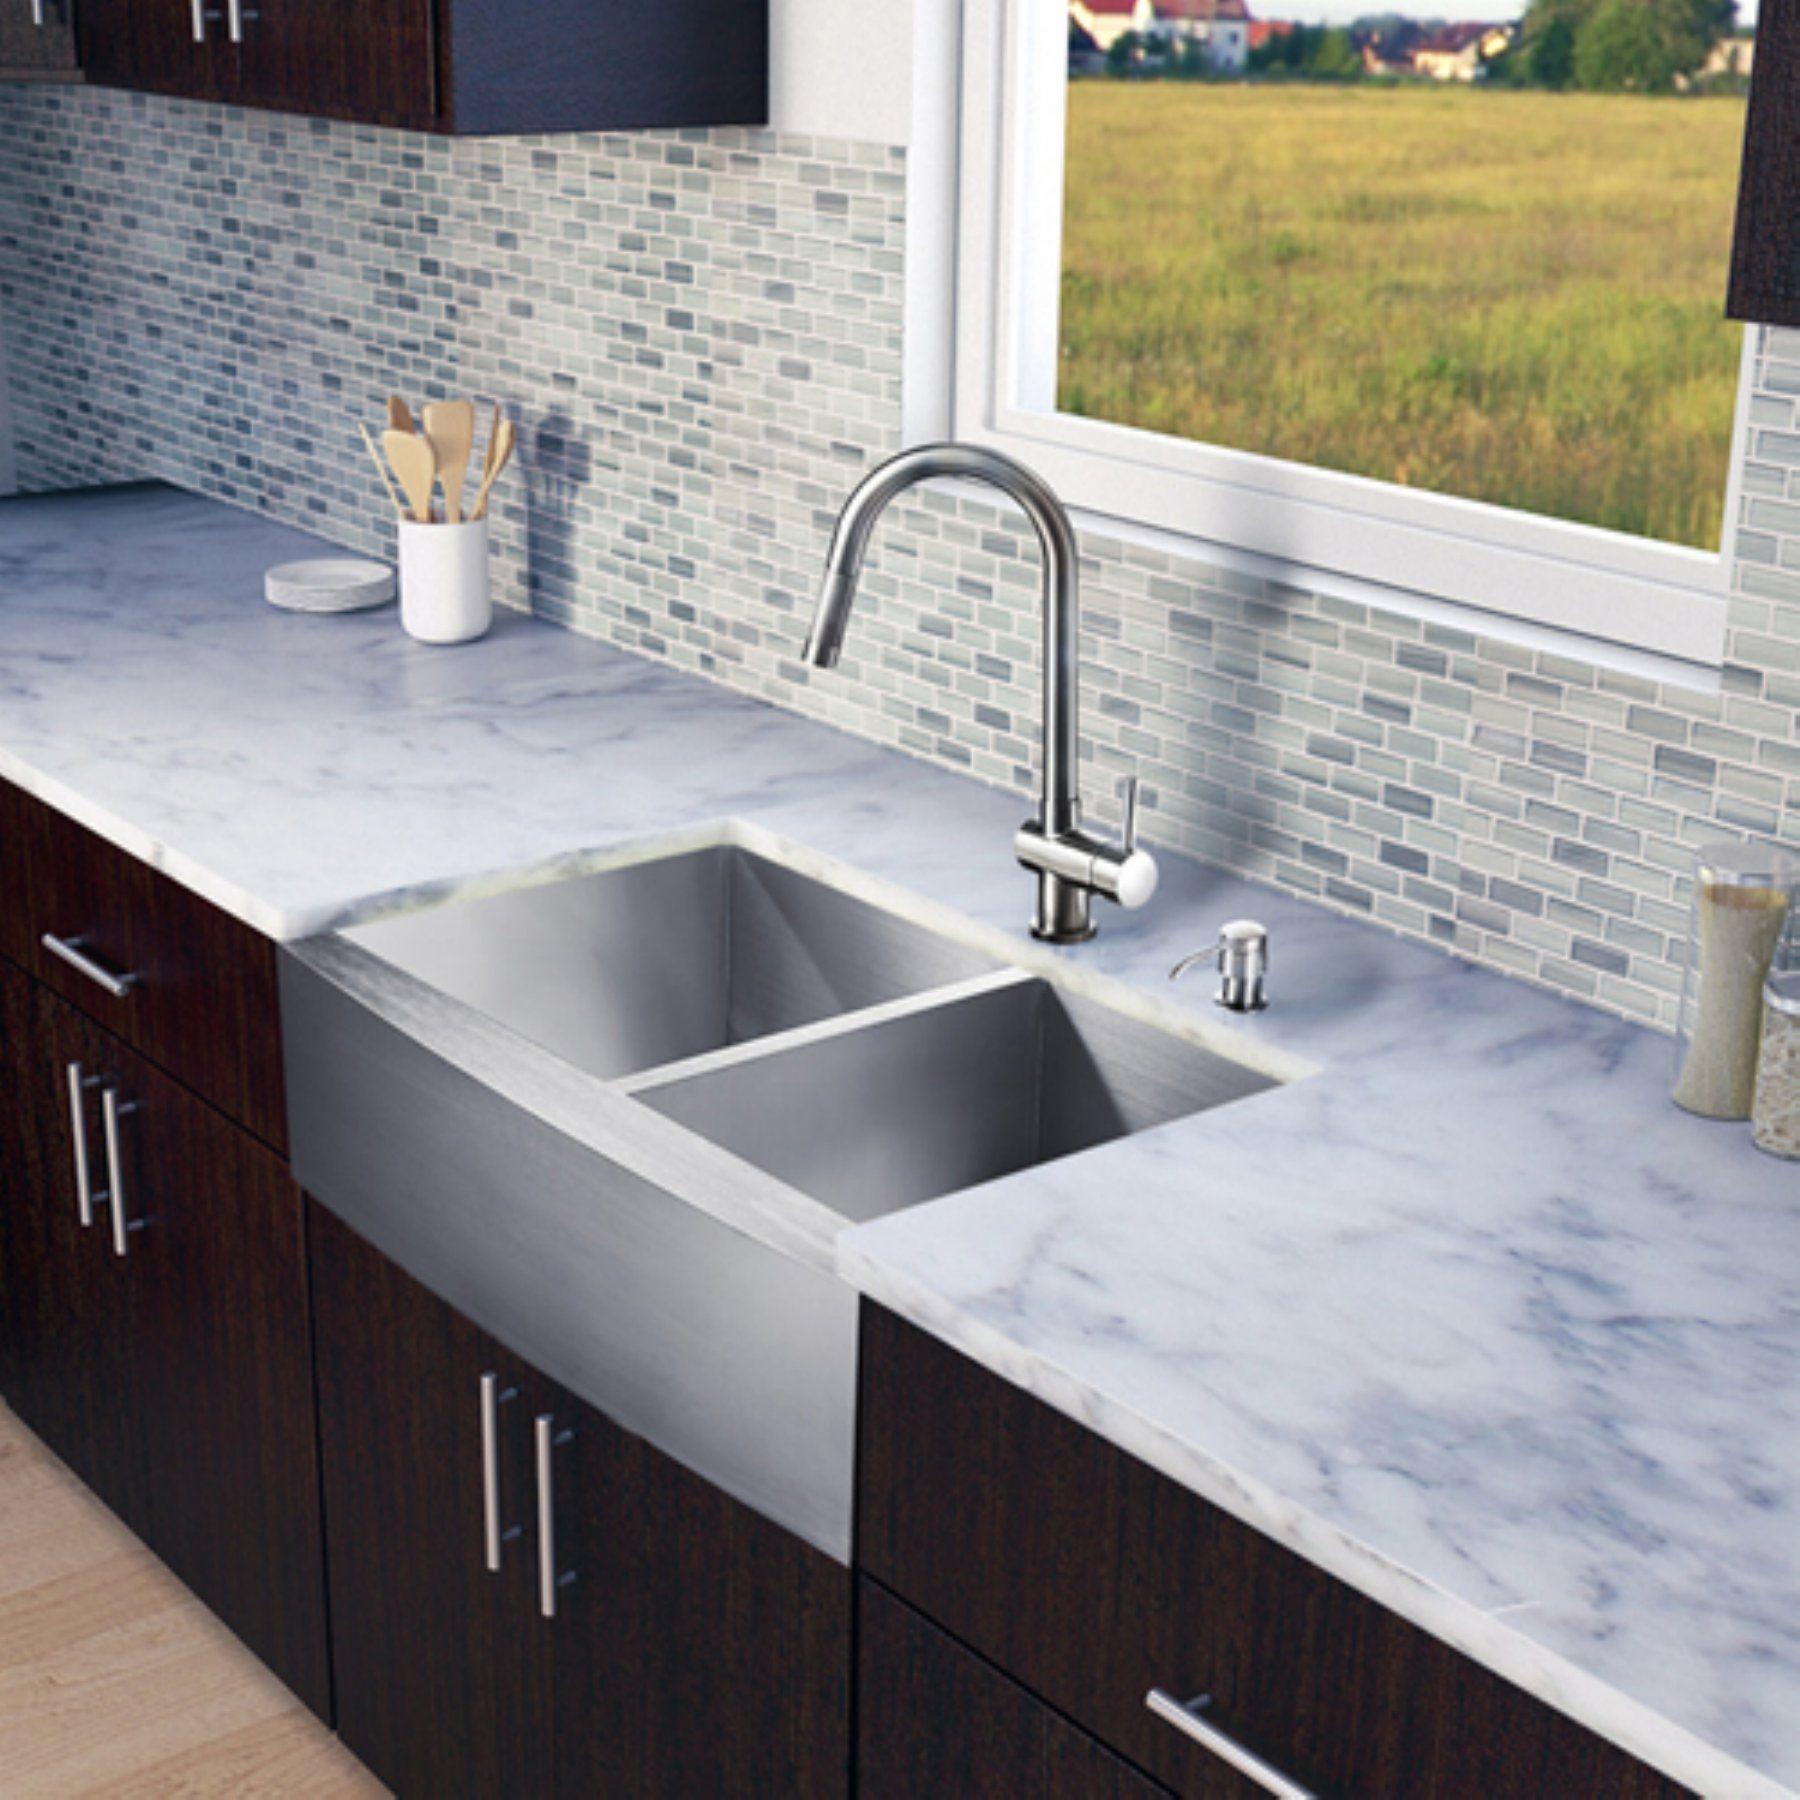 Vigo VG15135 Double Basin Farmhouse Kitchen Sink and